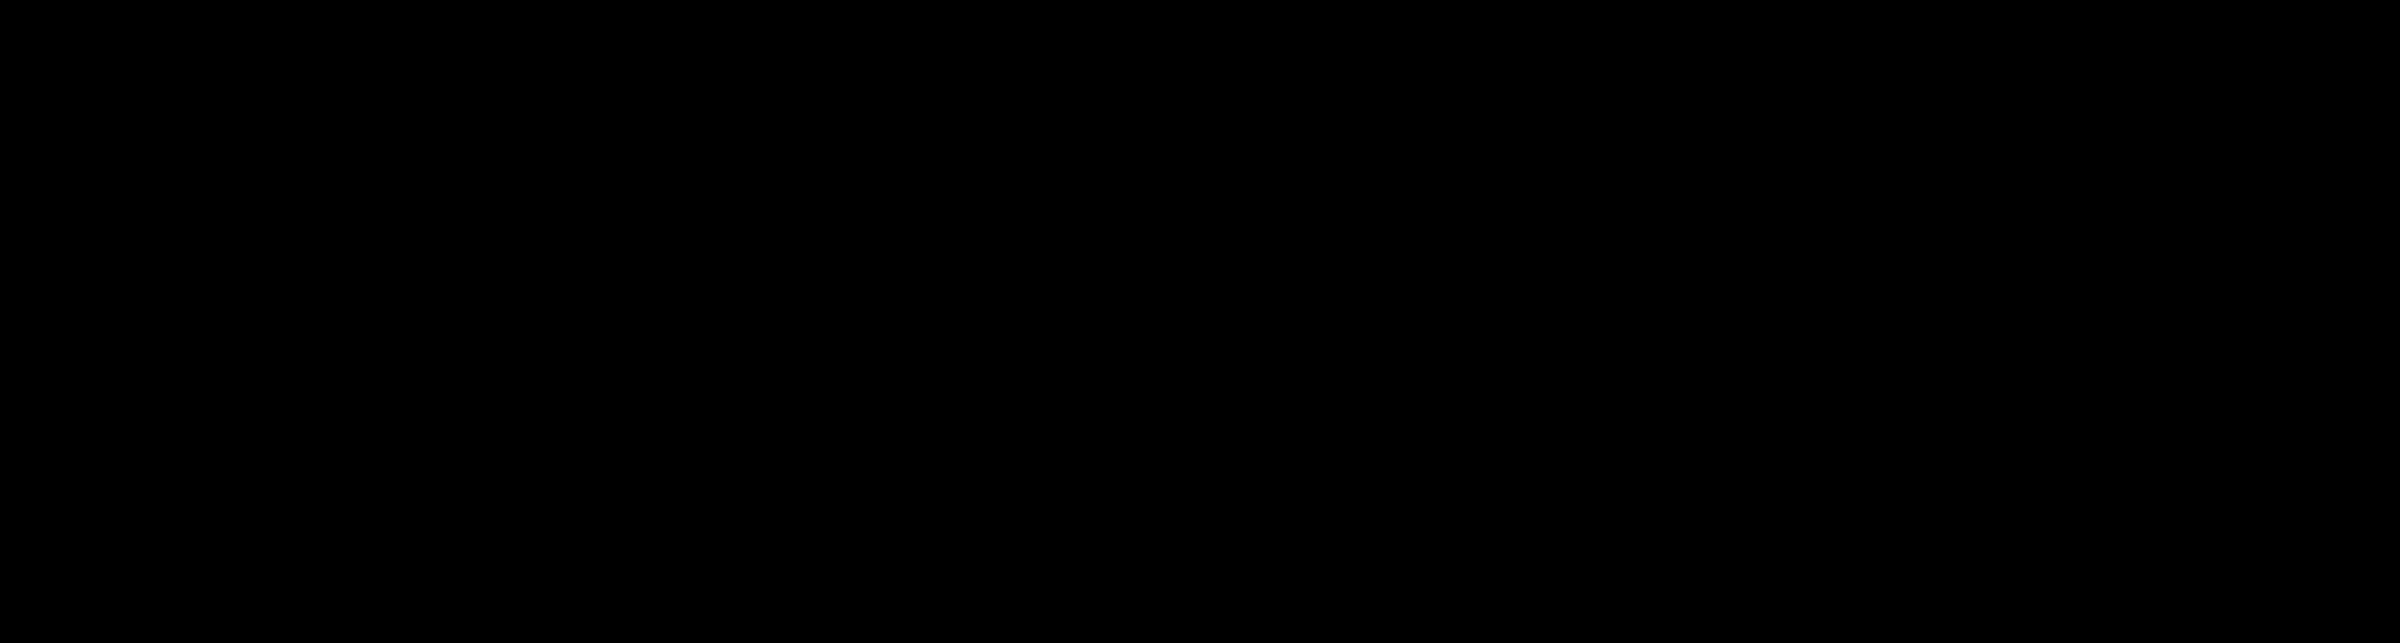 Bobcat 3 Logo Png Transparent Svg Vector Freebie Supply